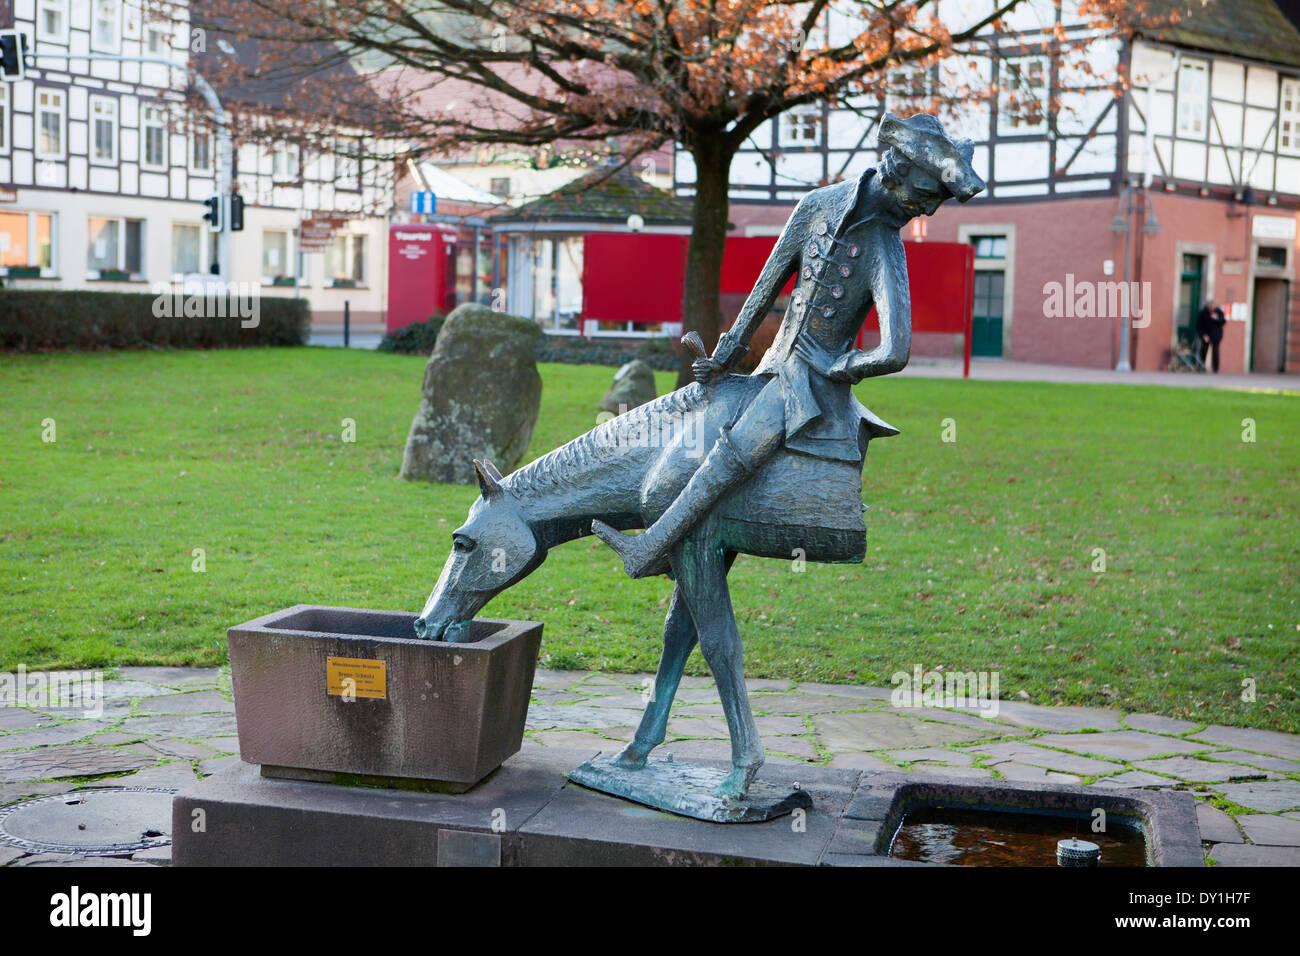 Baron Muenchhausen escultura, Bodenwerder, Weserbergland, Baja Sajonia, Alemania Foto de stock